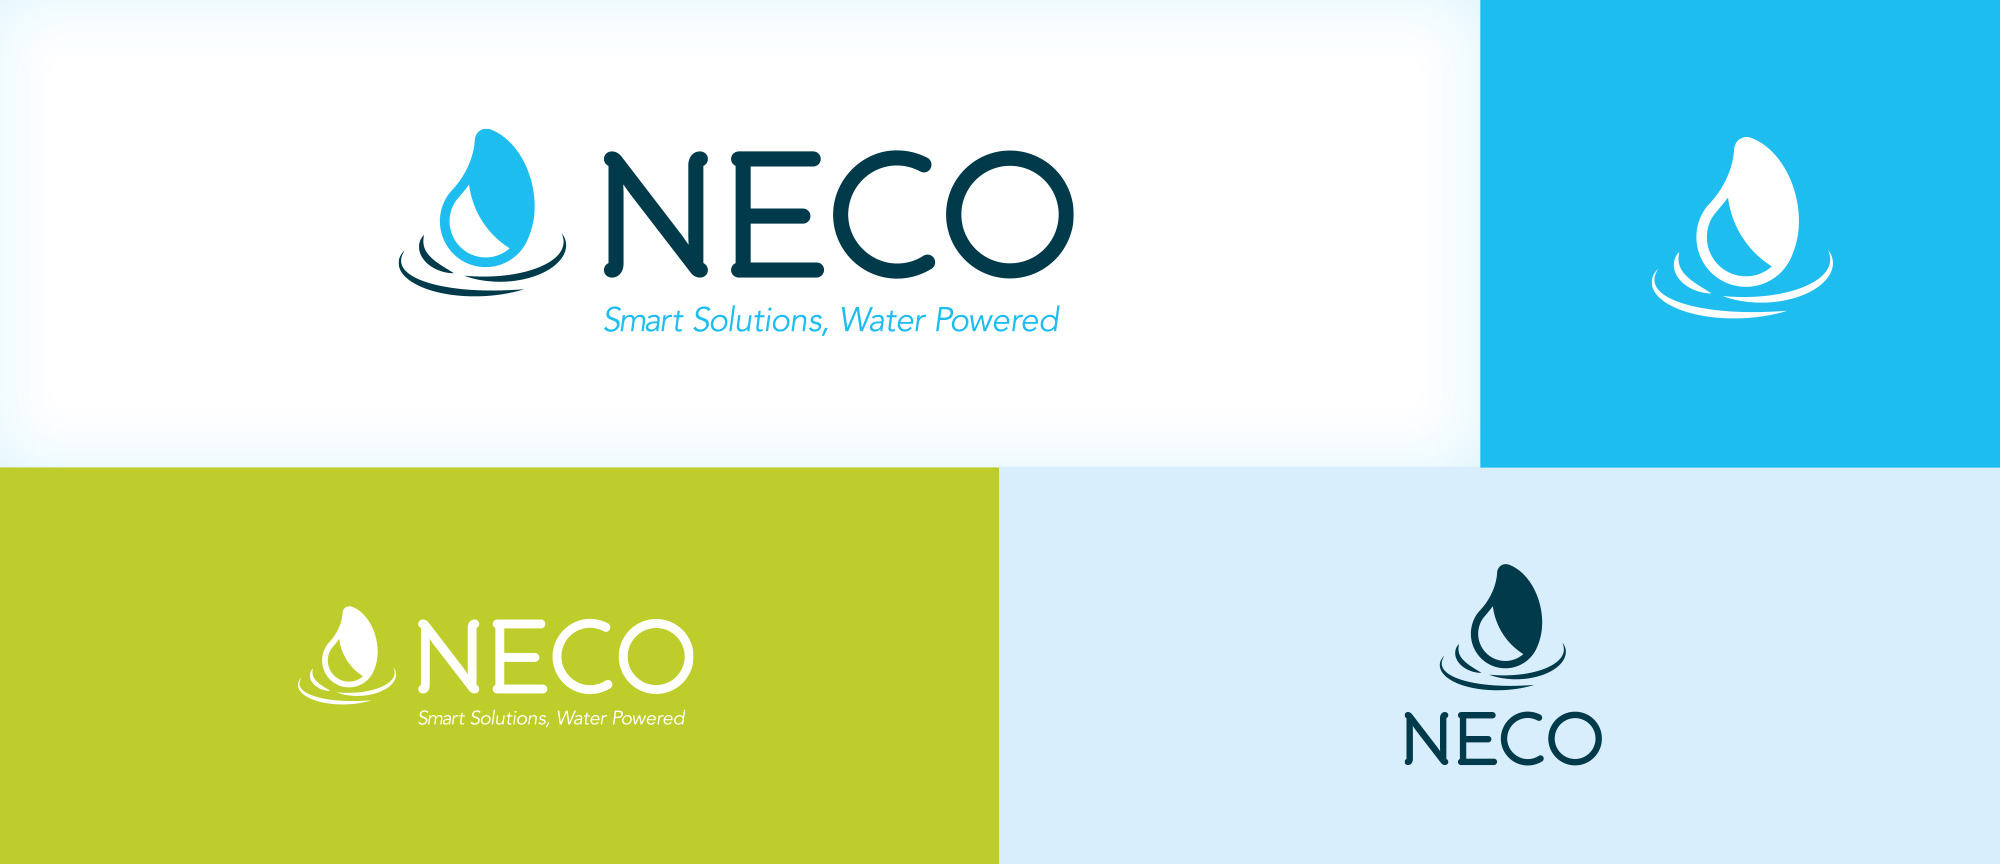 NECO-Branding-logos-versions